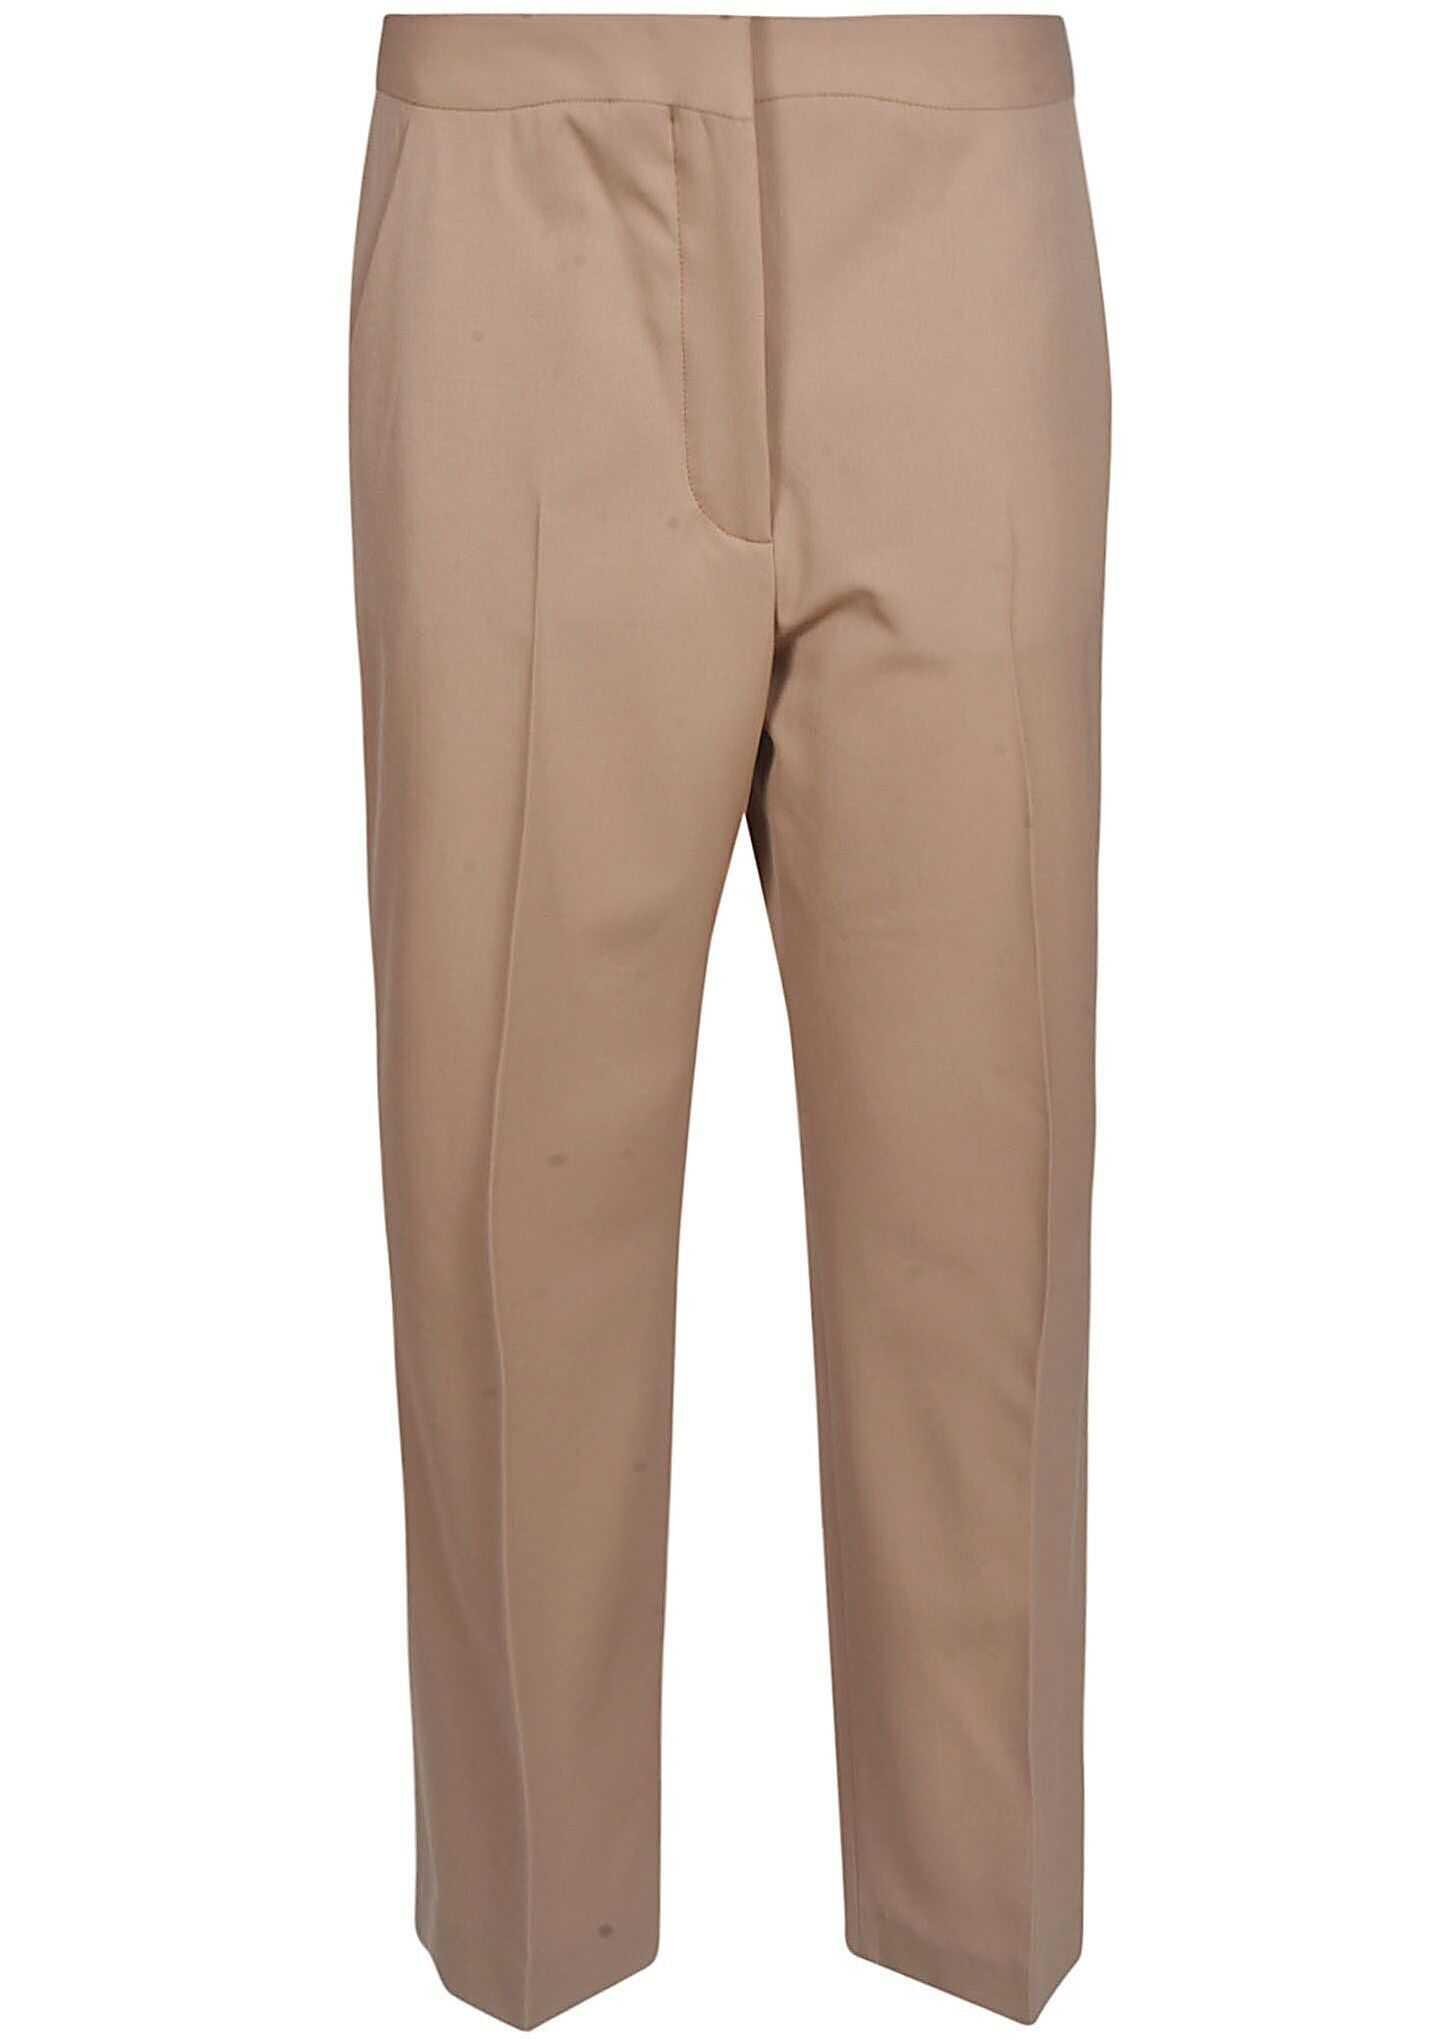 adidas by Stella McCartney Wool Pants BEIGE